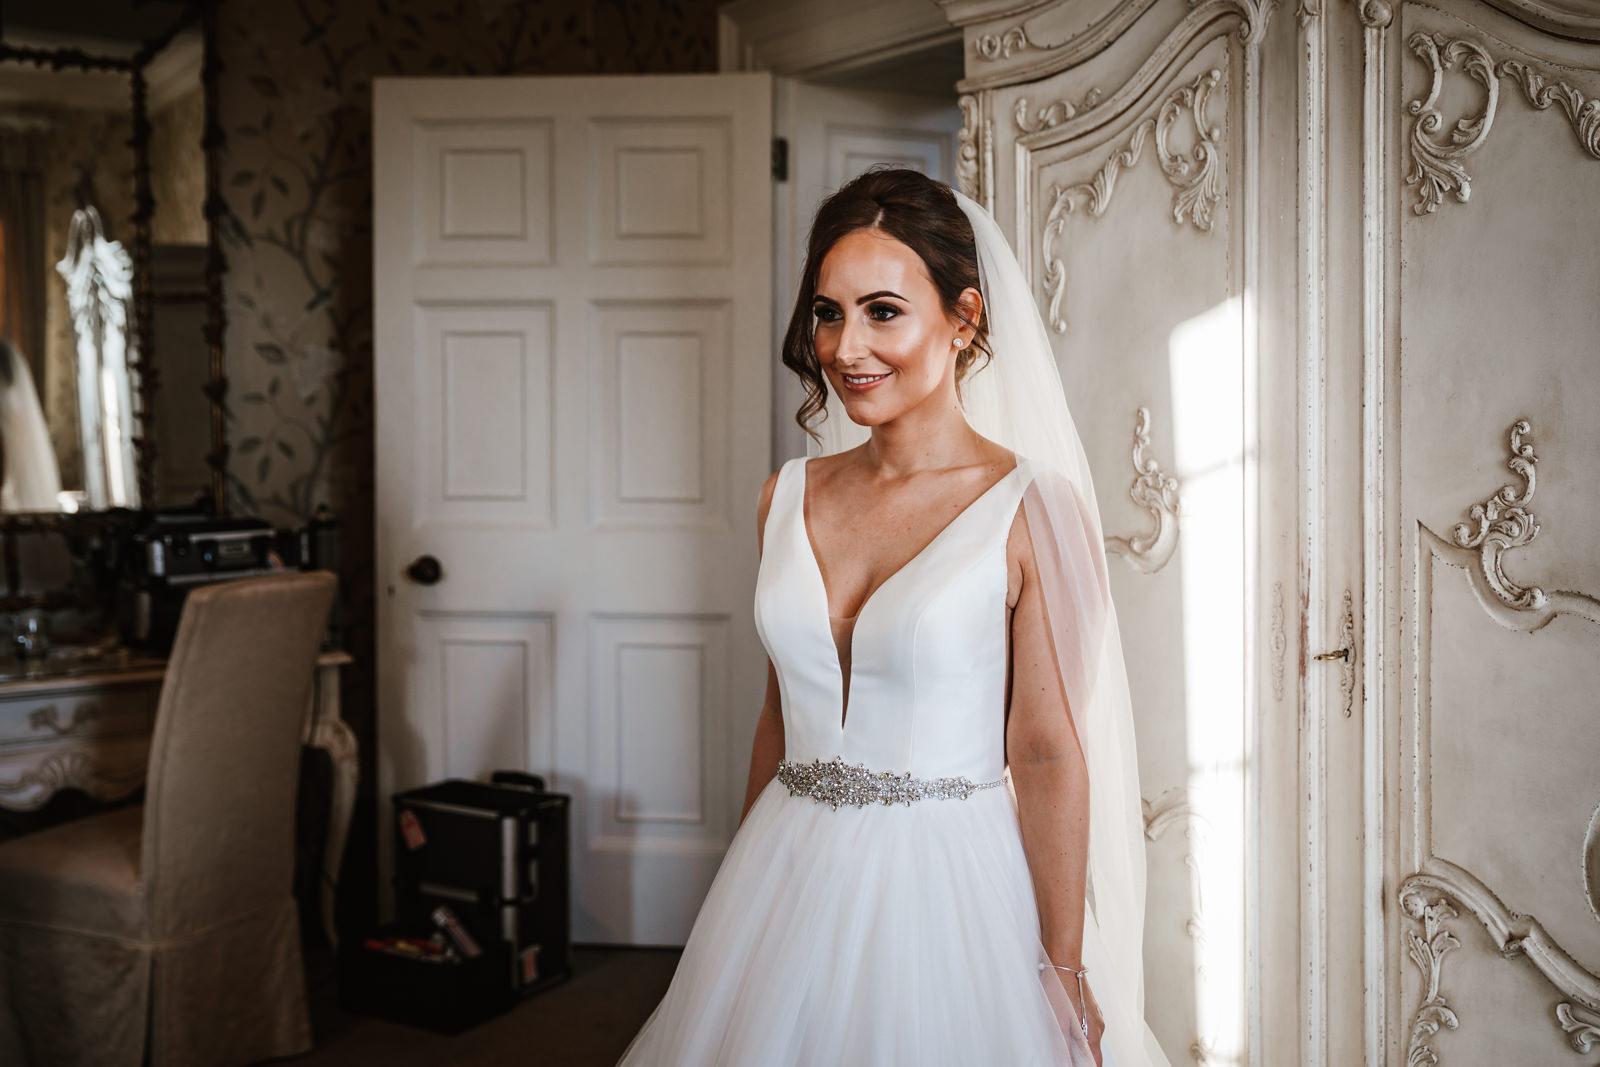 Bride looking beautiful in her wedding dress